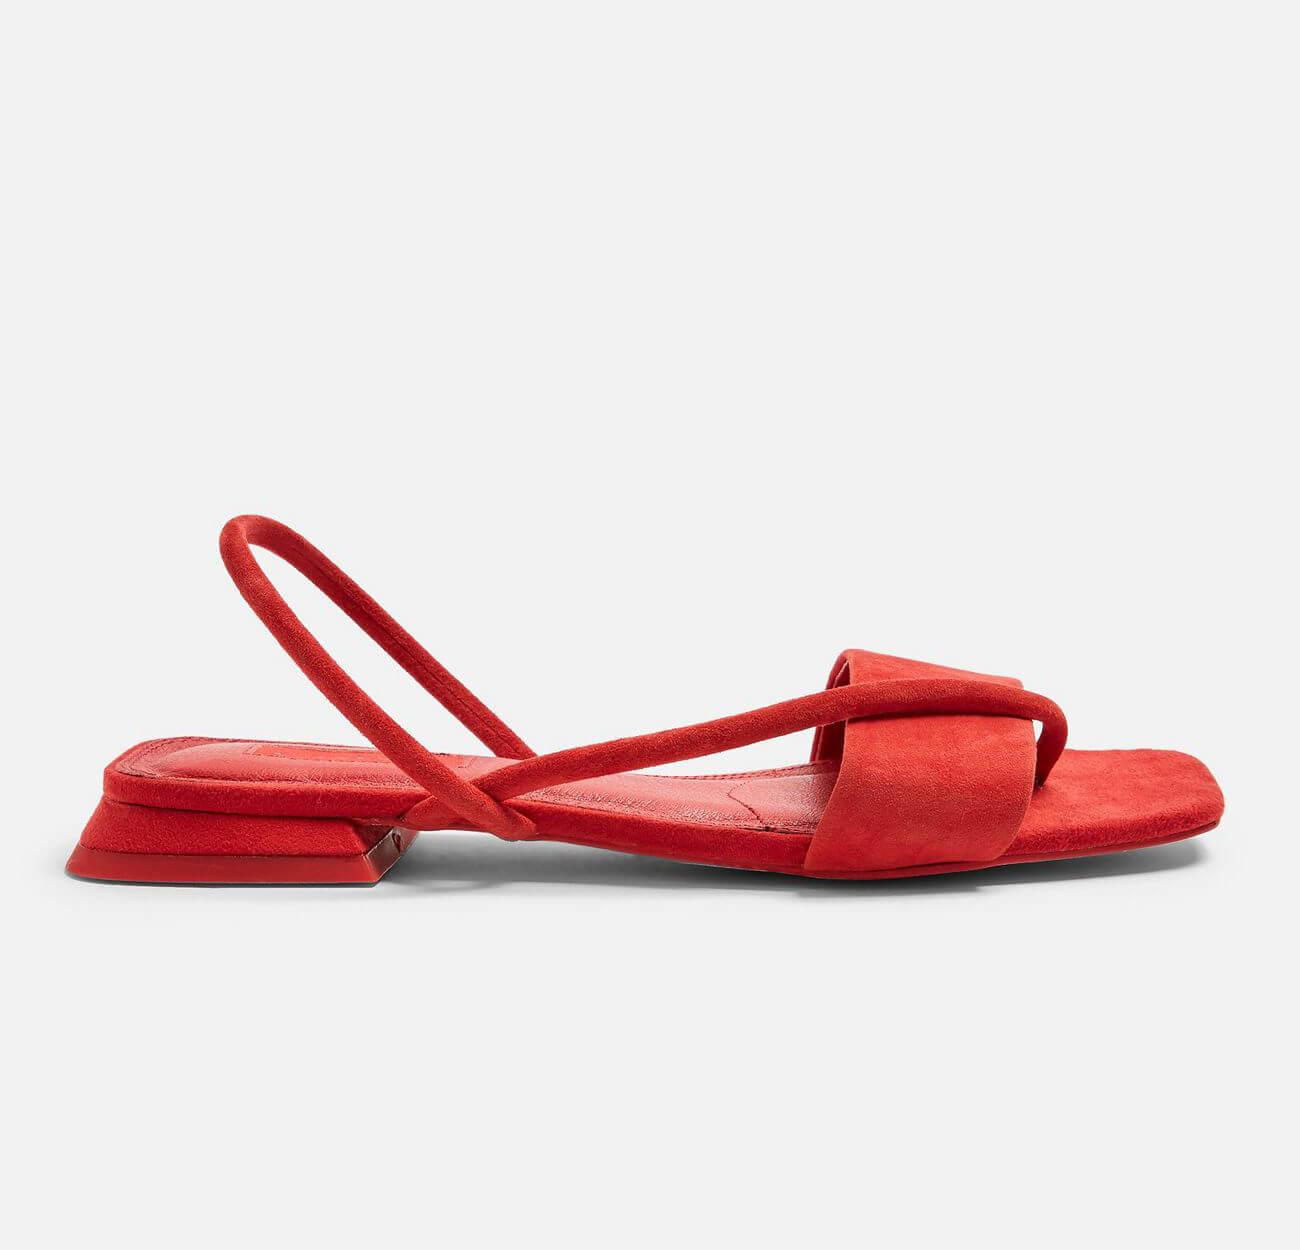 HESTER Red Sandals